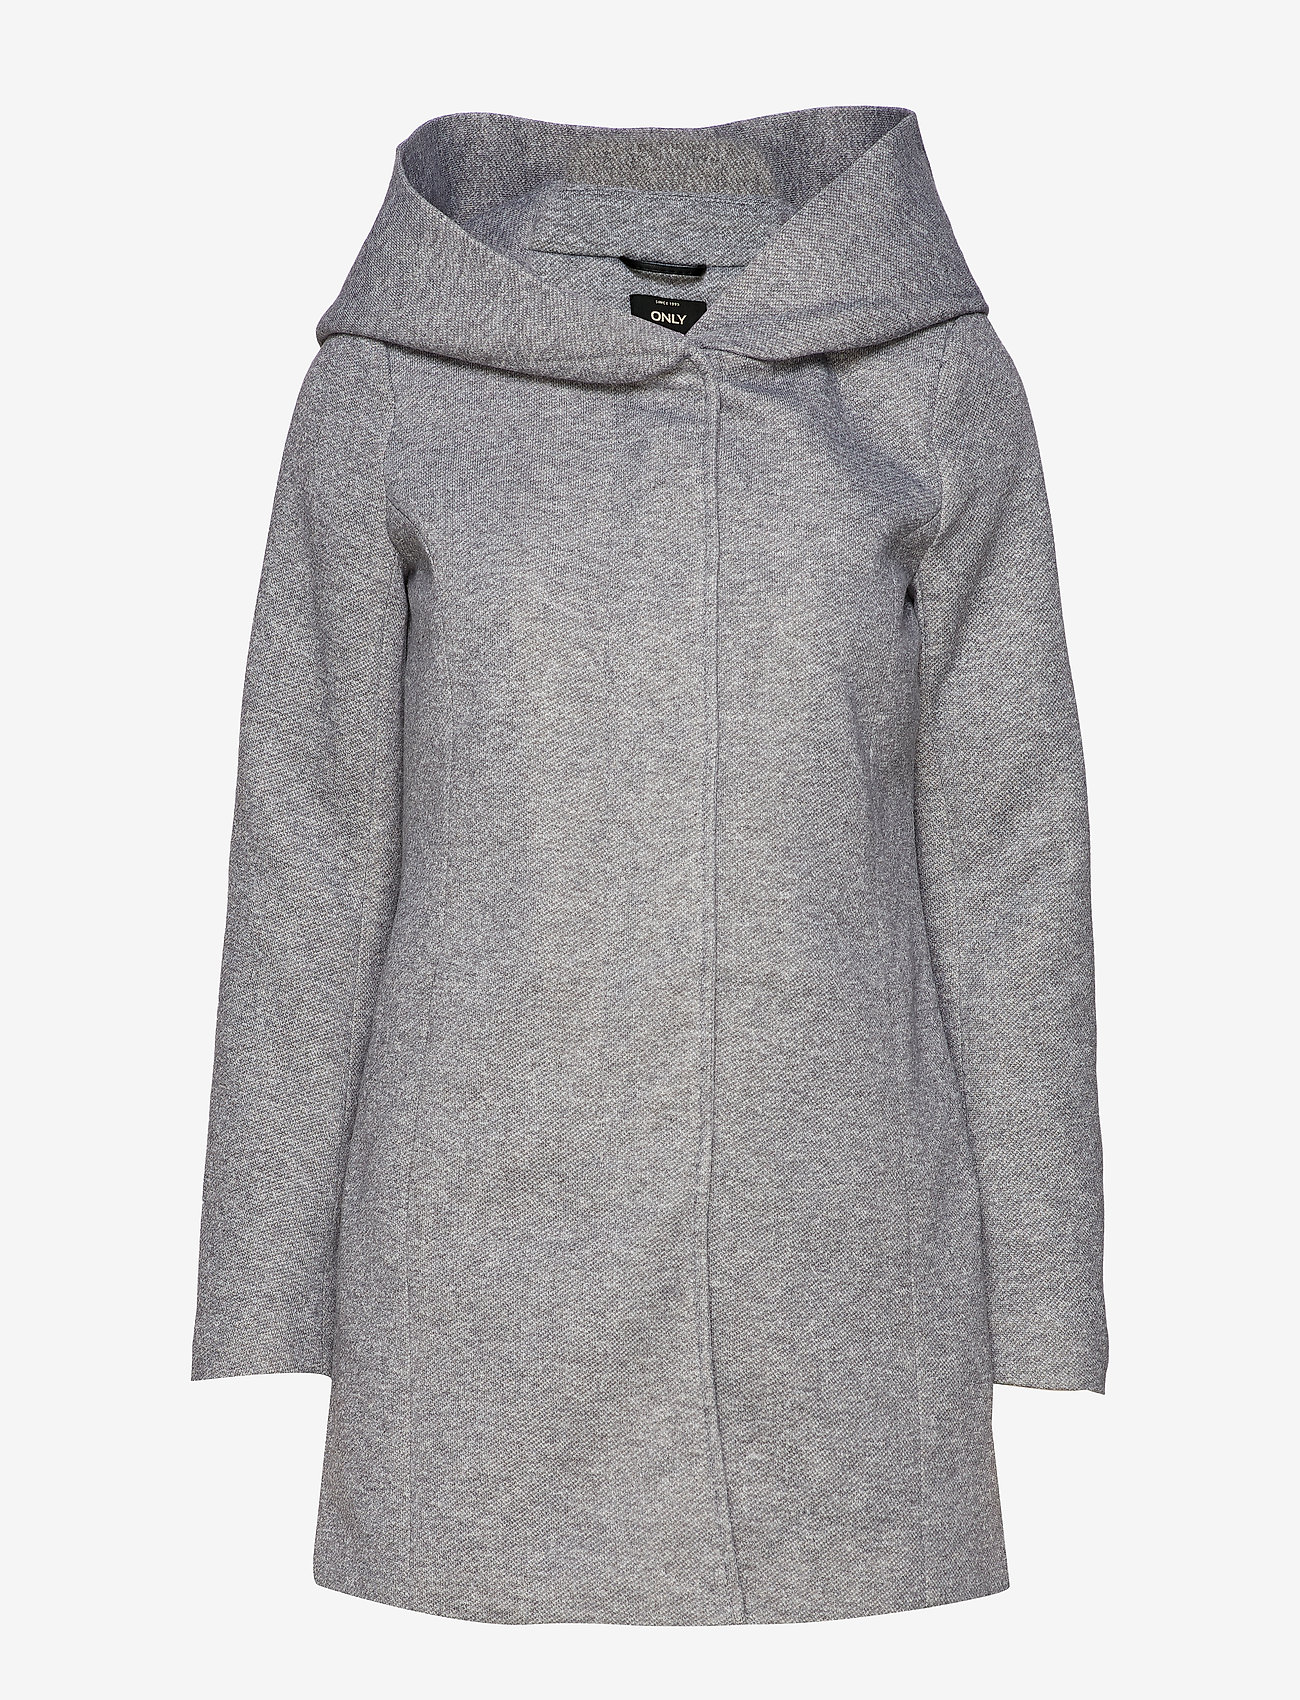 ONLY - ONLSEDONA LIGHT COAT OTW NOOS - cienkie płaszcze - light grey melange - 1